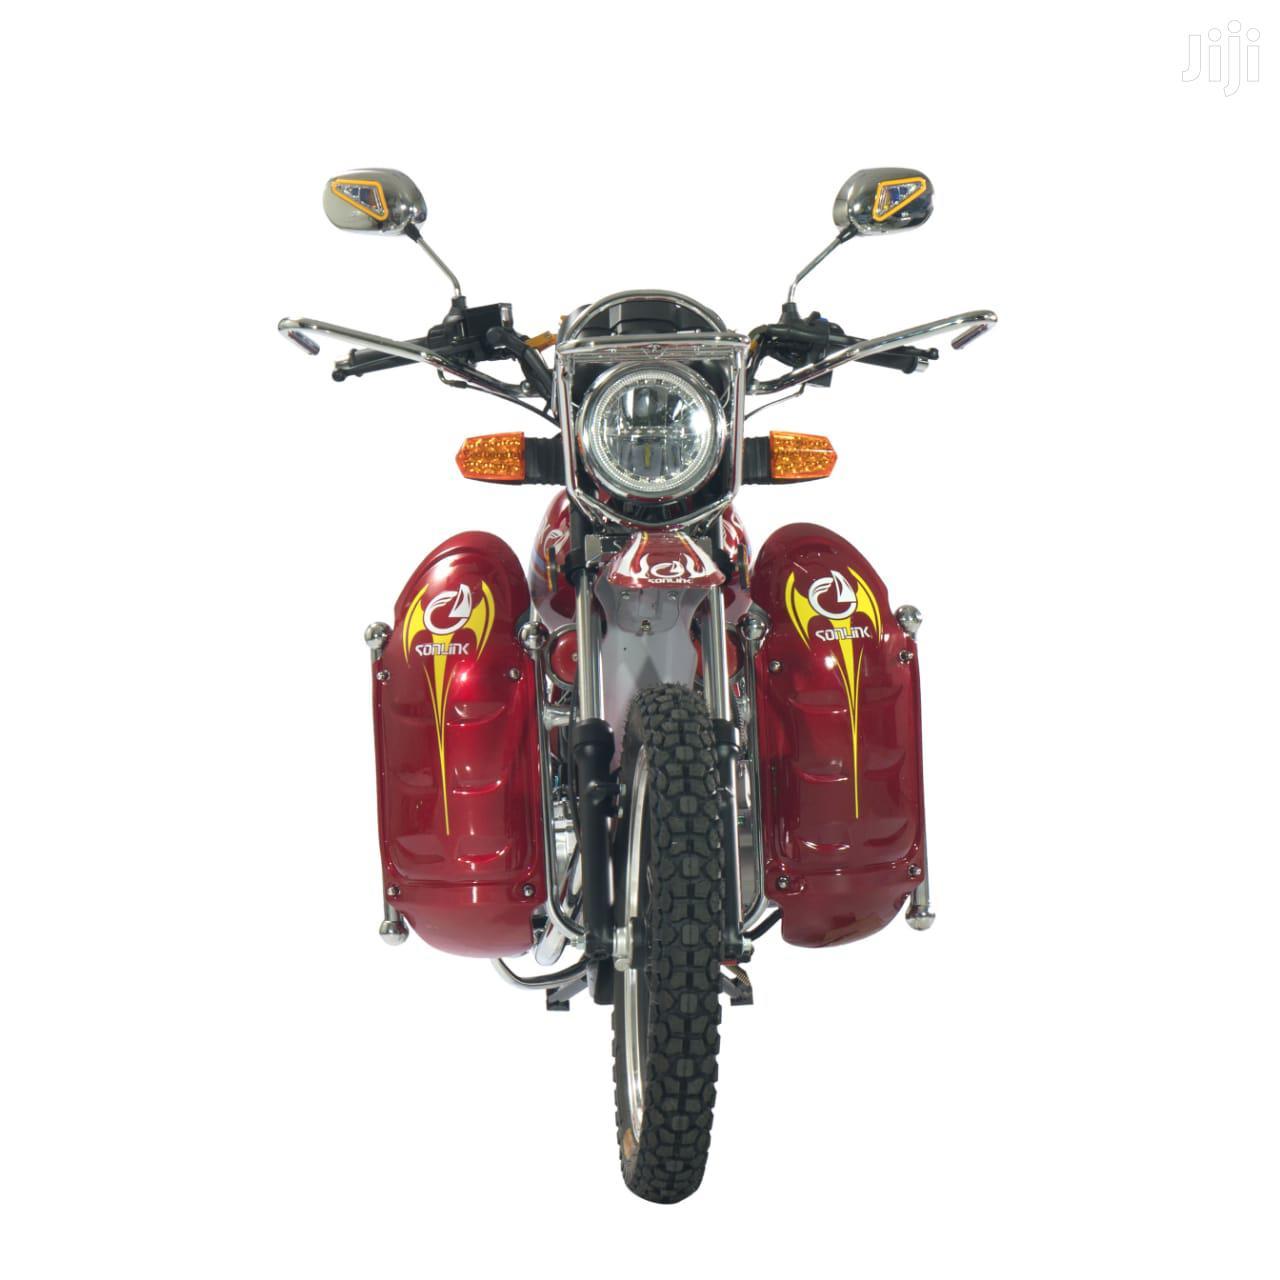 New Sonlink SL150-KA 2019 Red | Motorcycles & Scooters for sale in Nairobi Central, Nairobi, Kenya